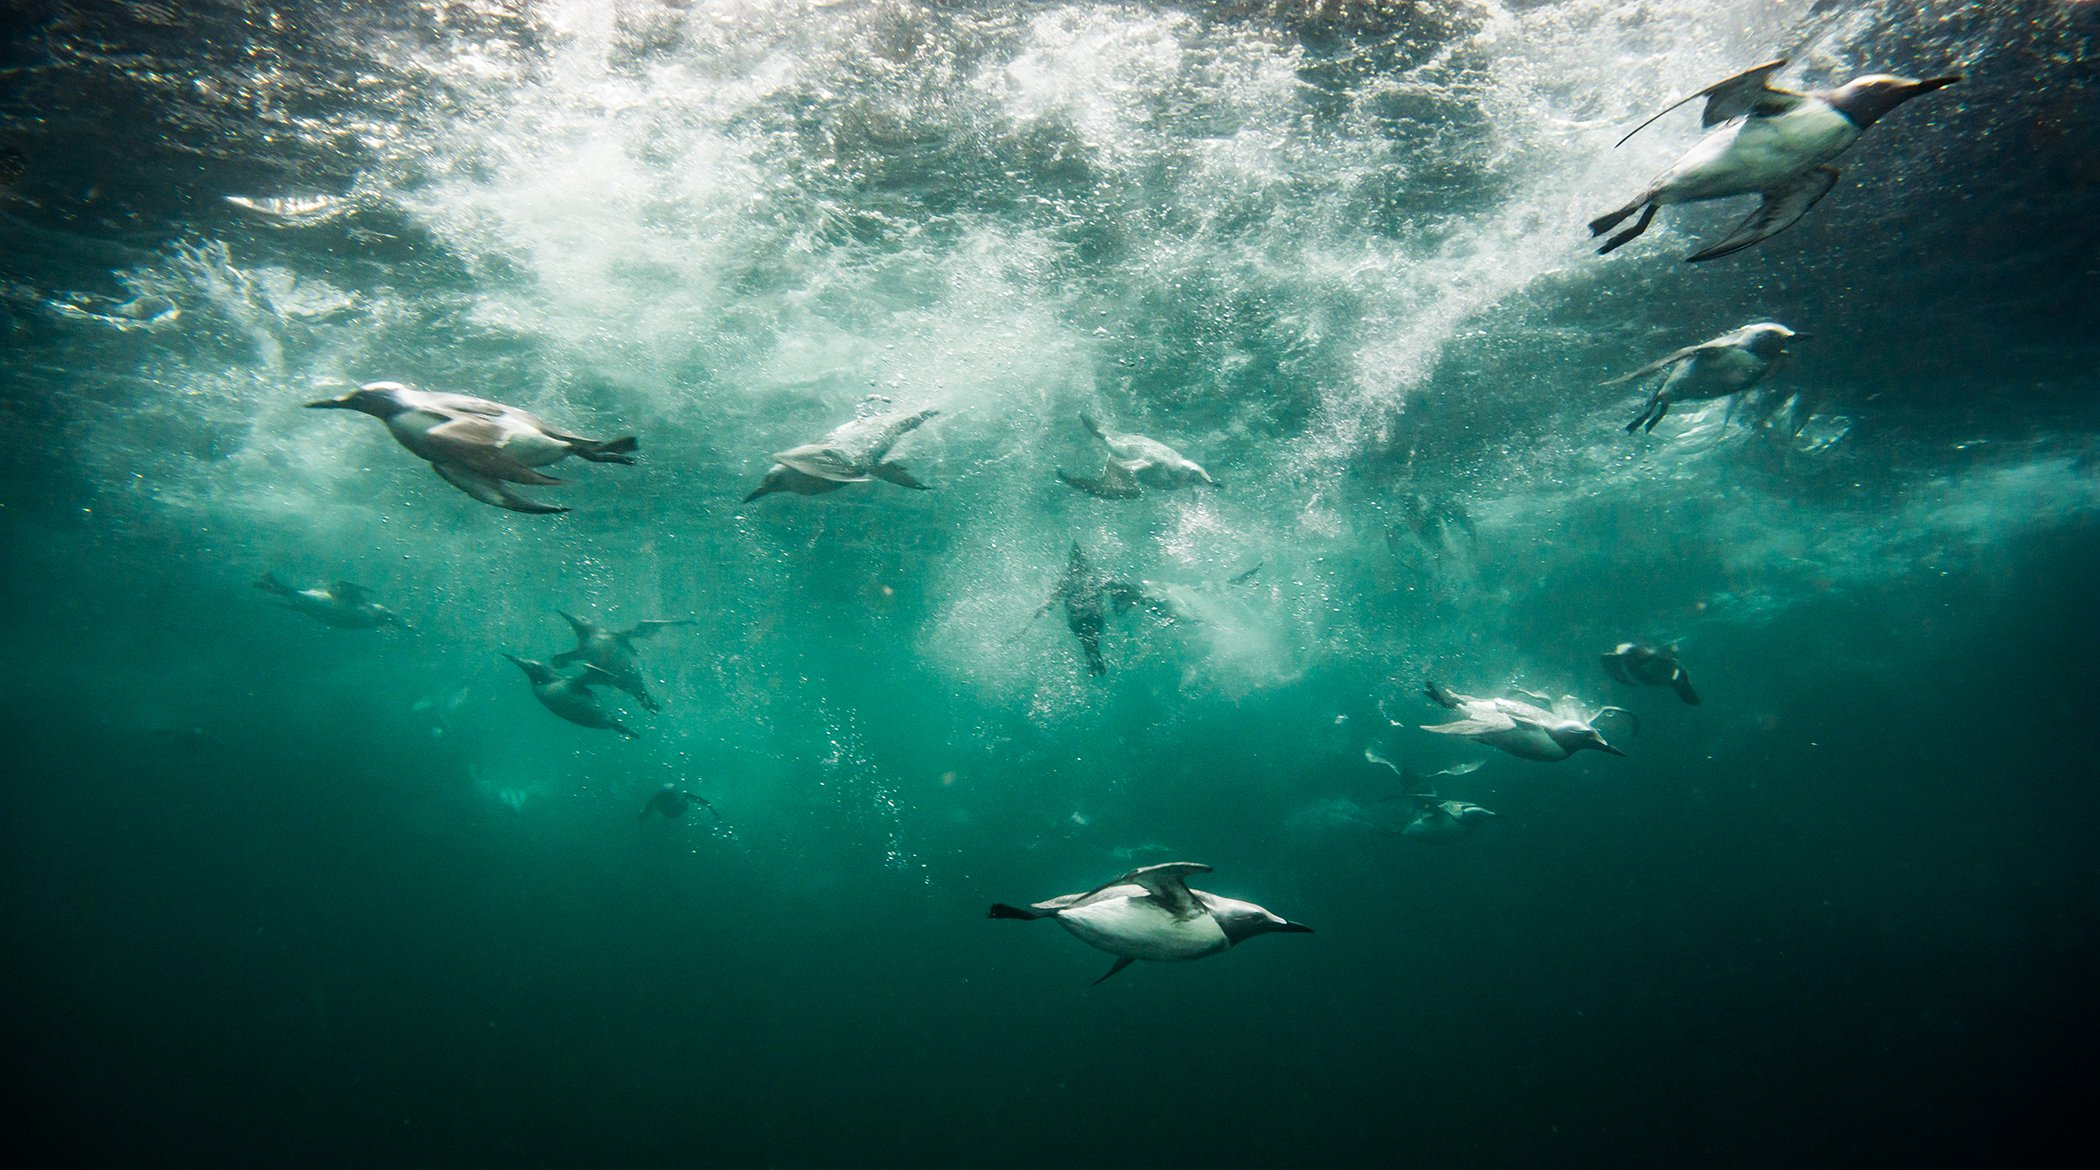 UnderwaterPhotographerOfTheYear_910RobertCuss_013.jpg